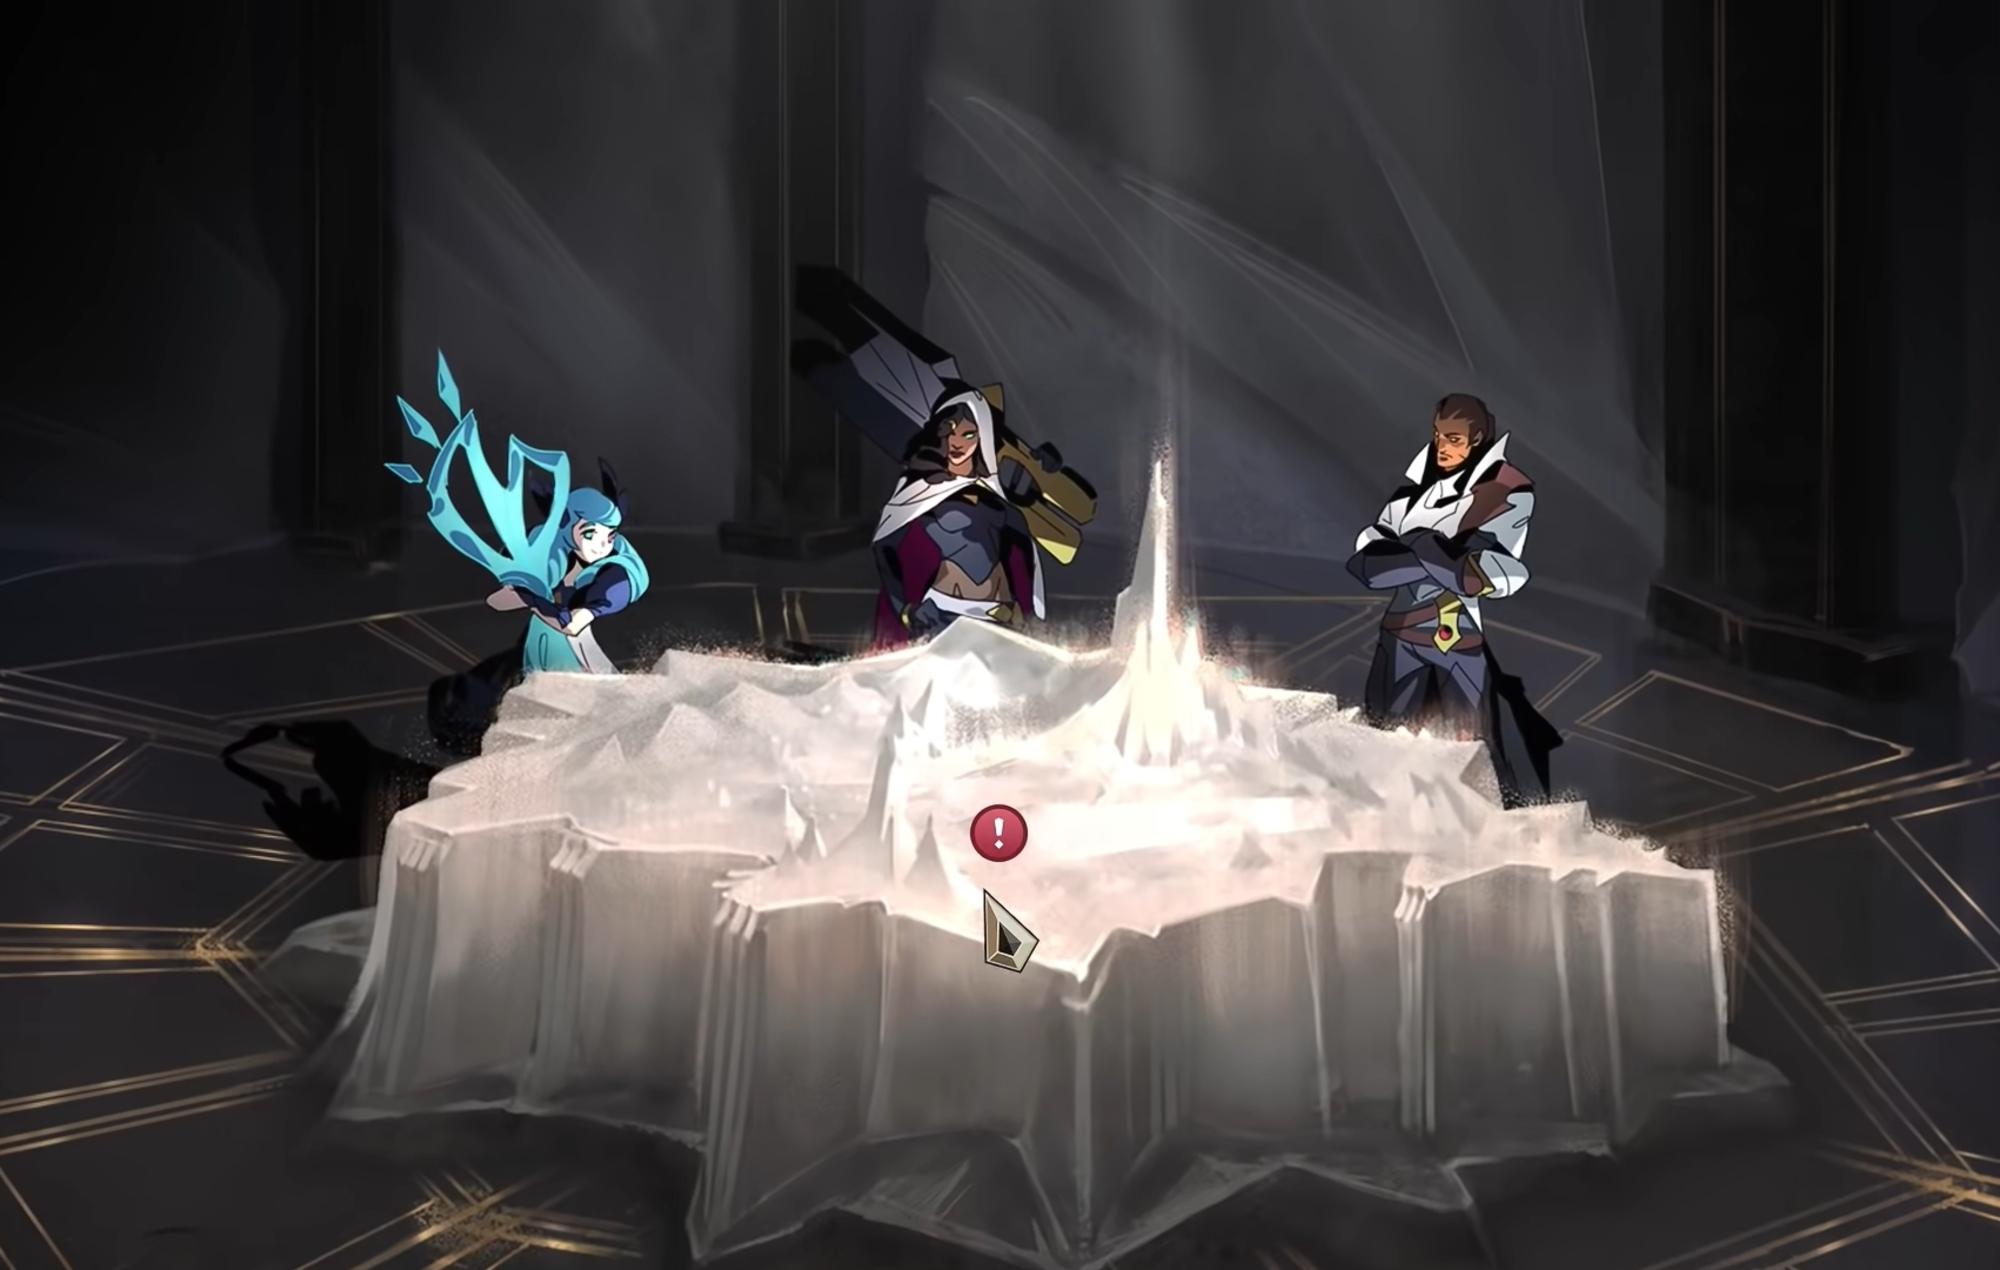 League of legends sentinels of light event 2000x1270